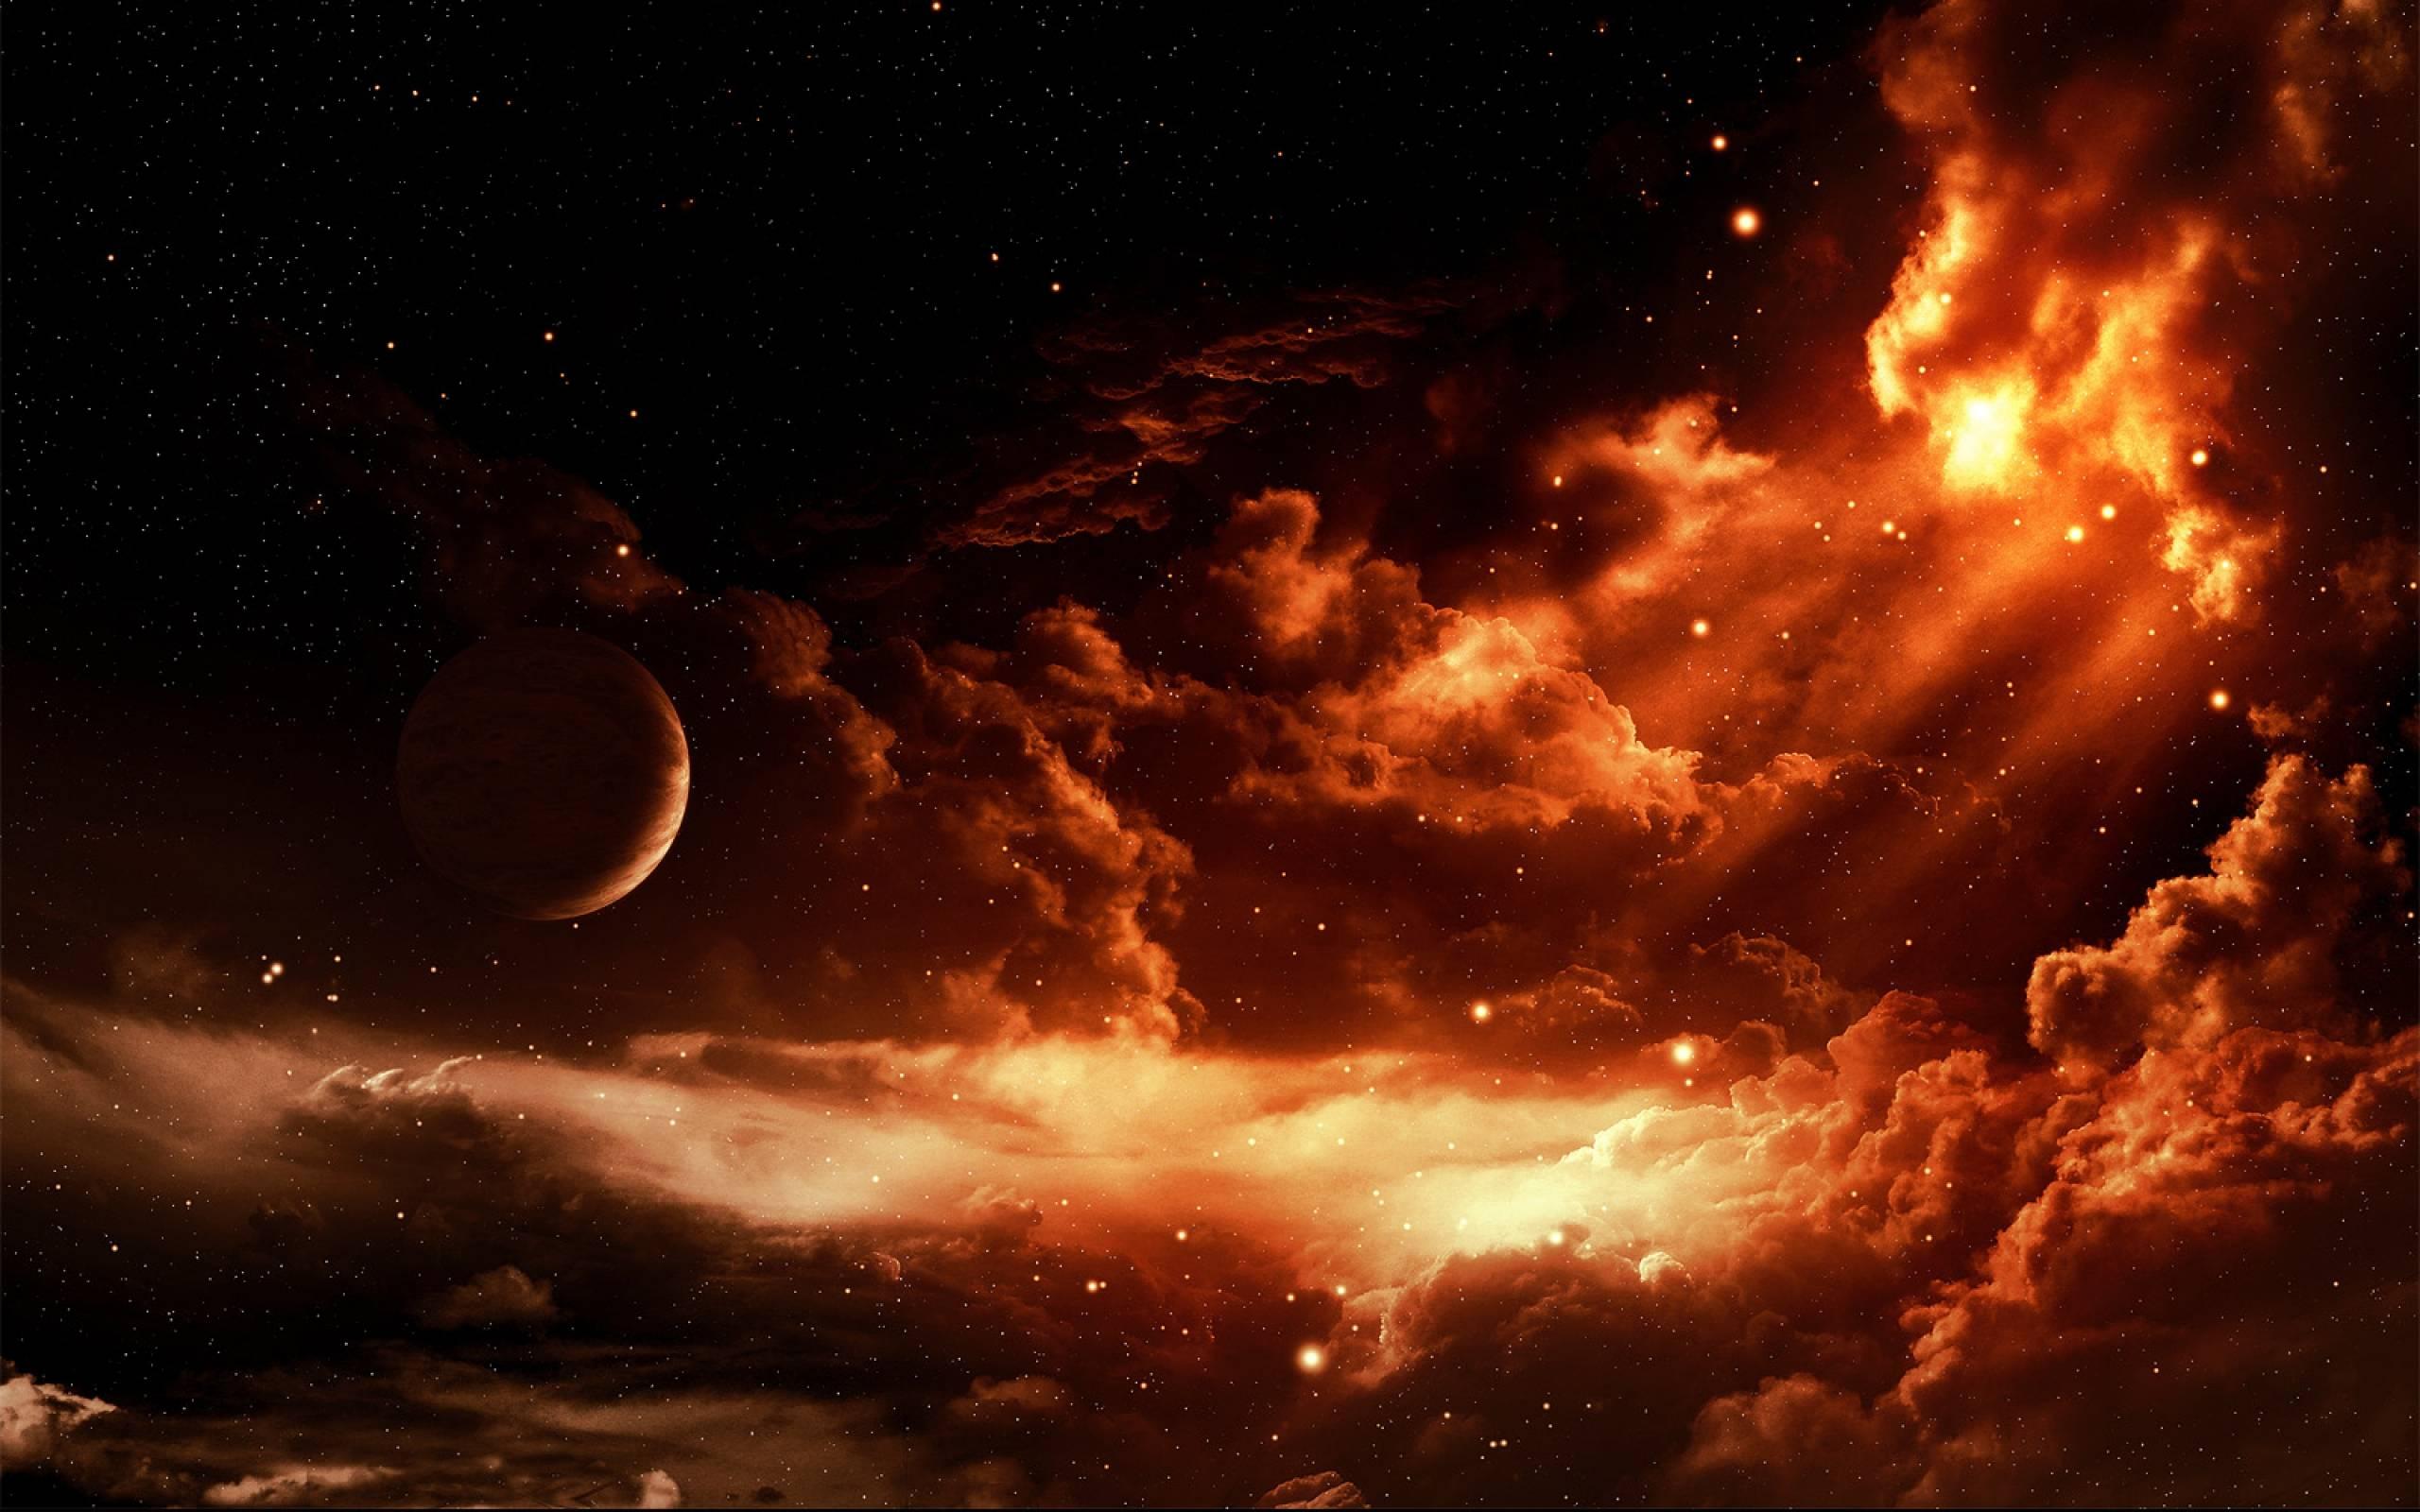 fire planet space wallpaper - photo #22